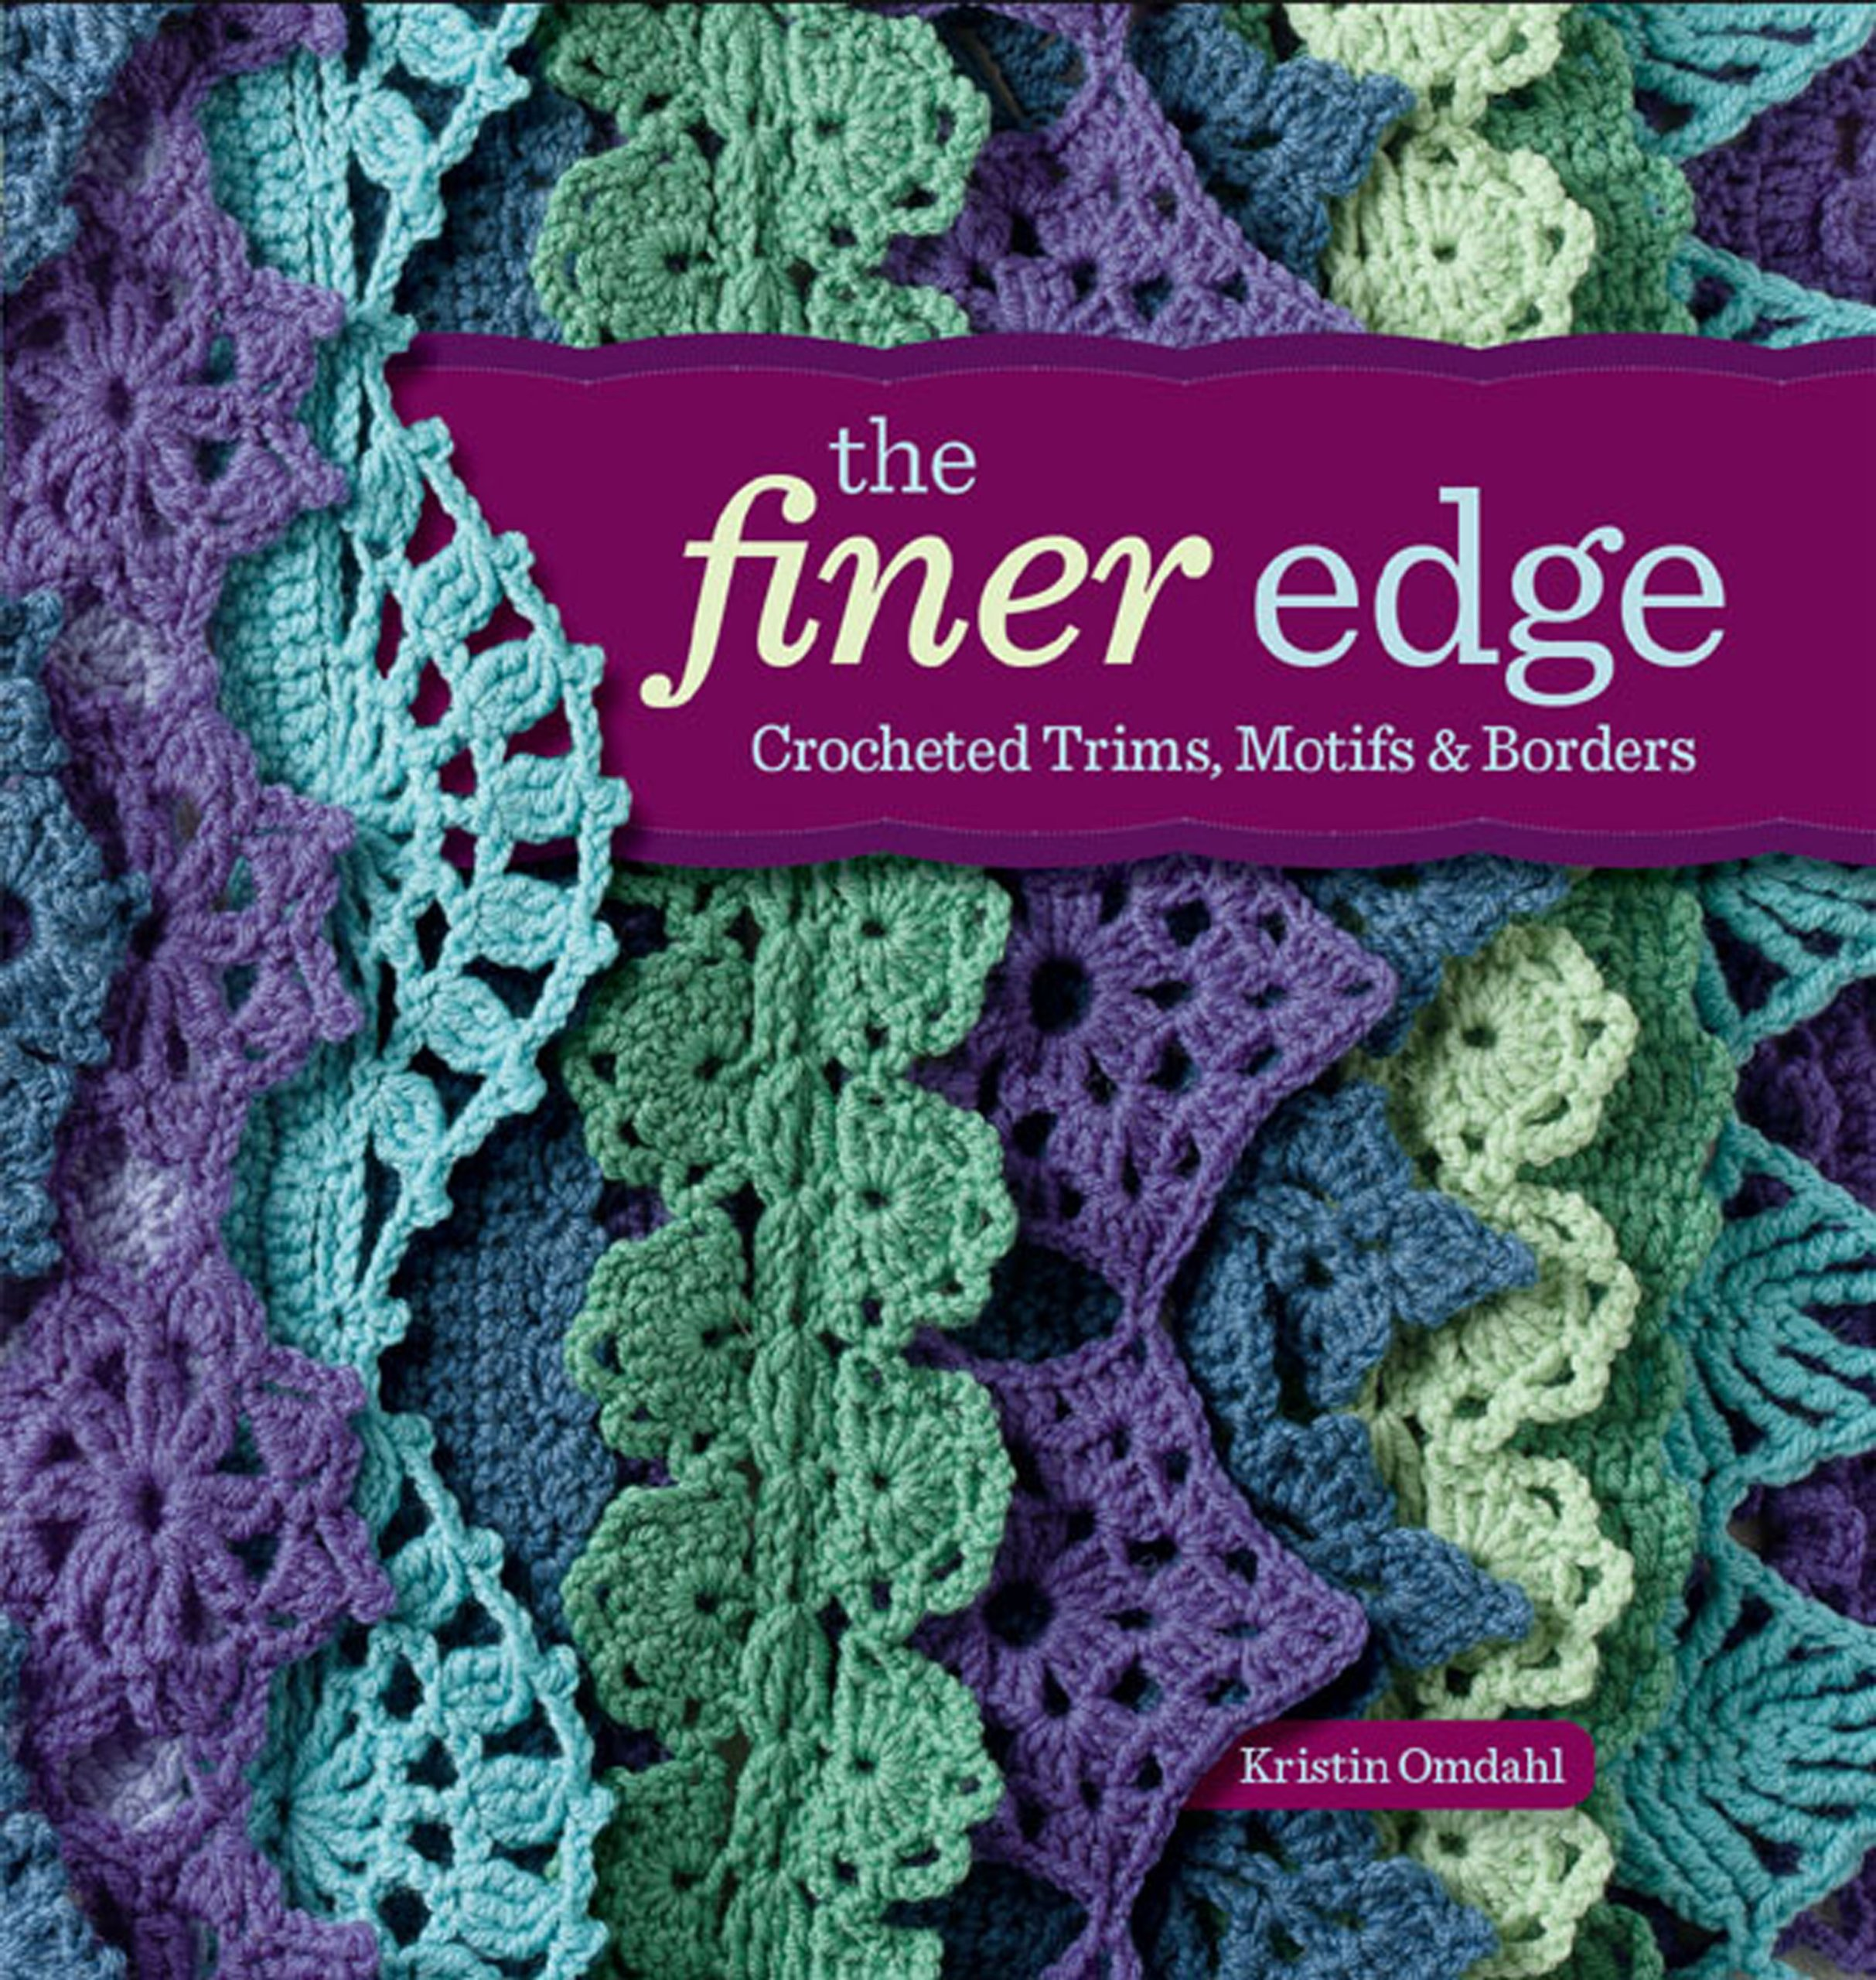 The Finer Edge: Crocheted Trims, Motifs & Borders